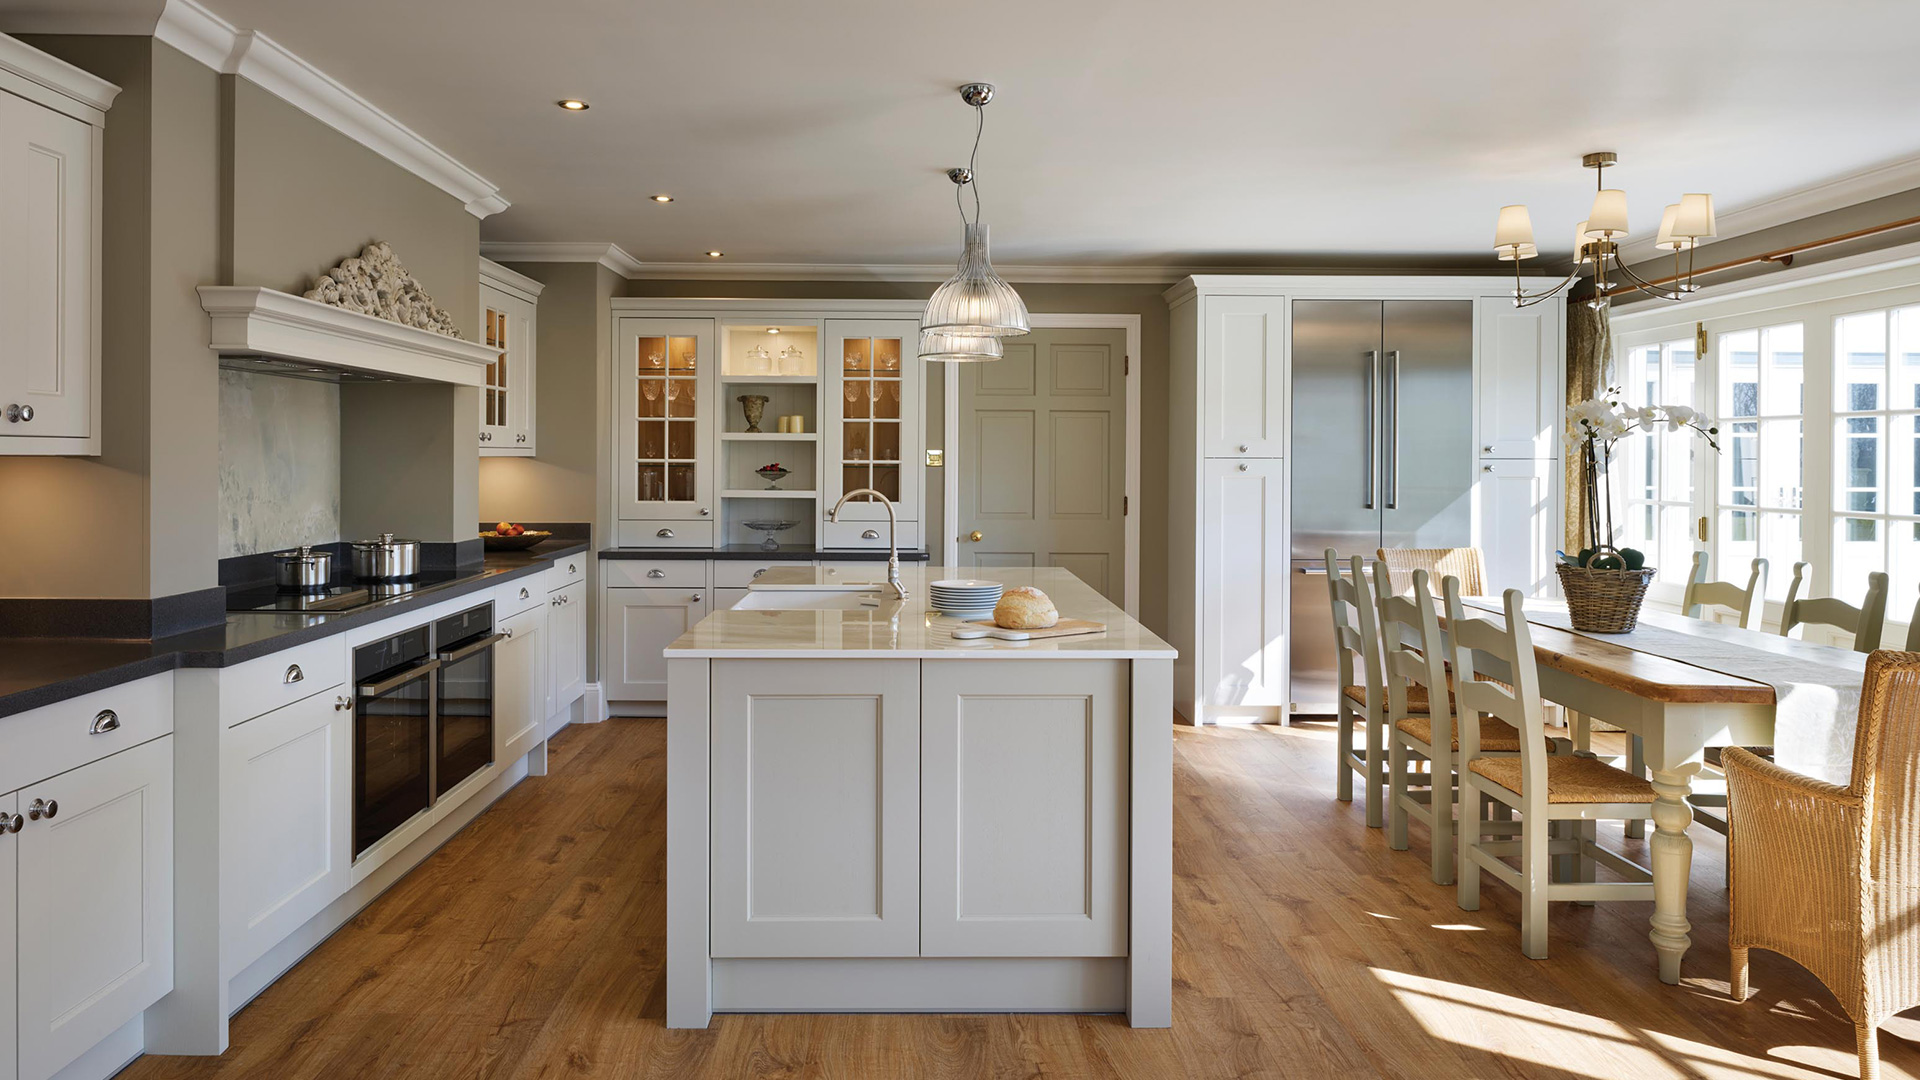 Country Kitchen & Utility Room With Quartz Worktop